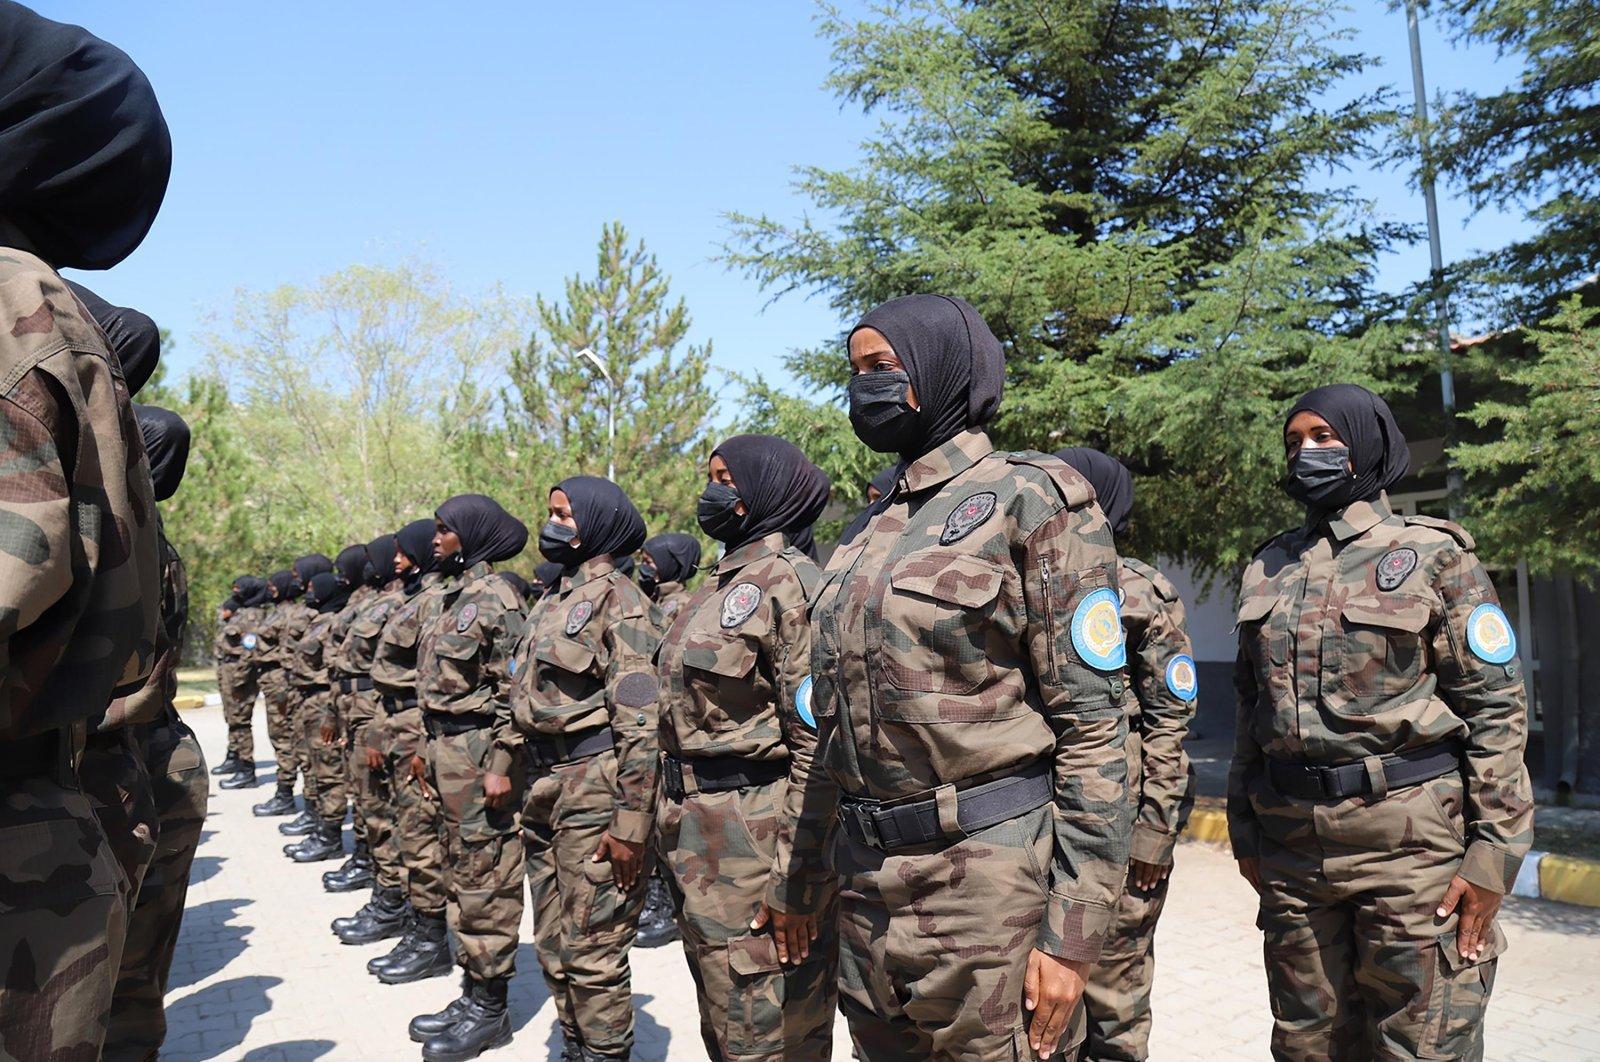 Somali female police commandos receive training in the capital Ankara, Turkey, Aug. 29, 2021. (DHA Photo)